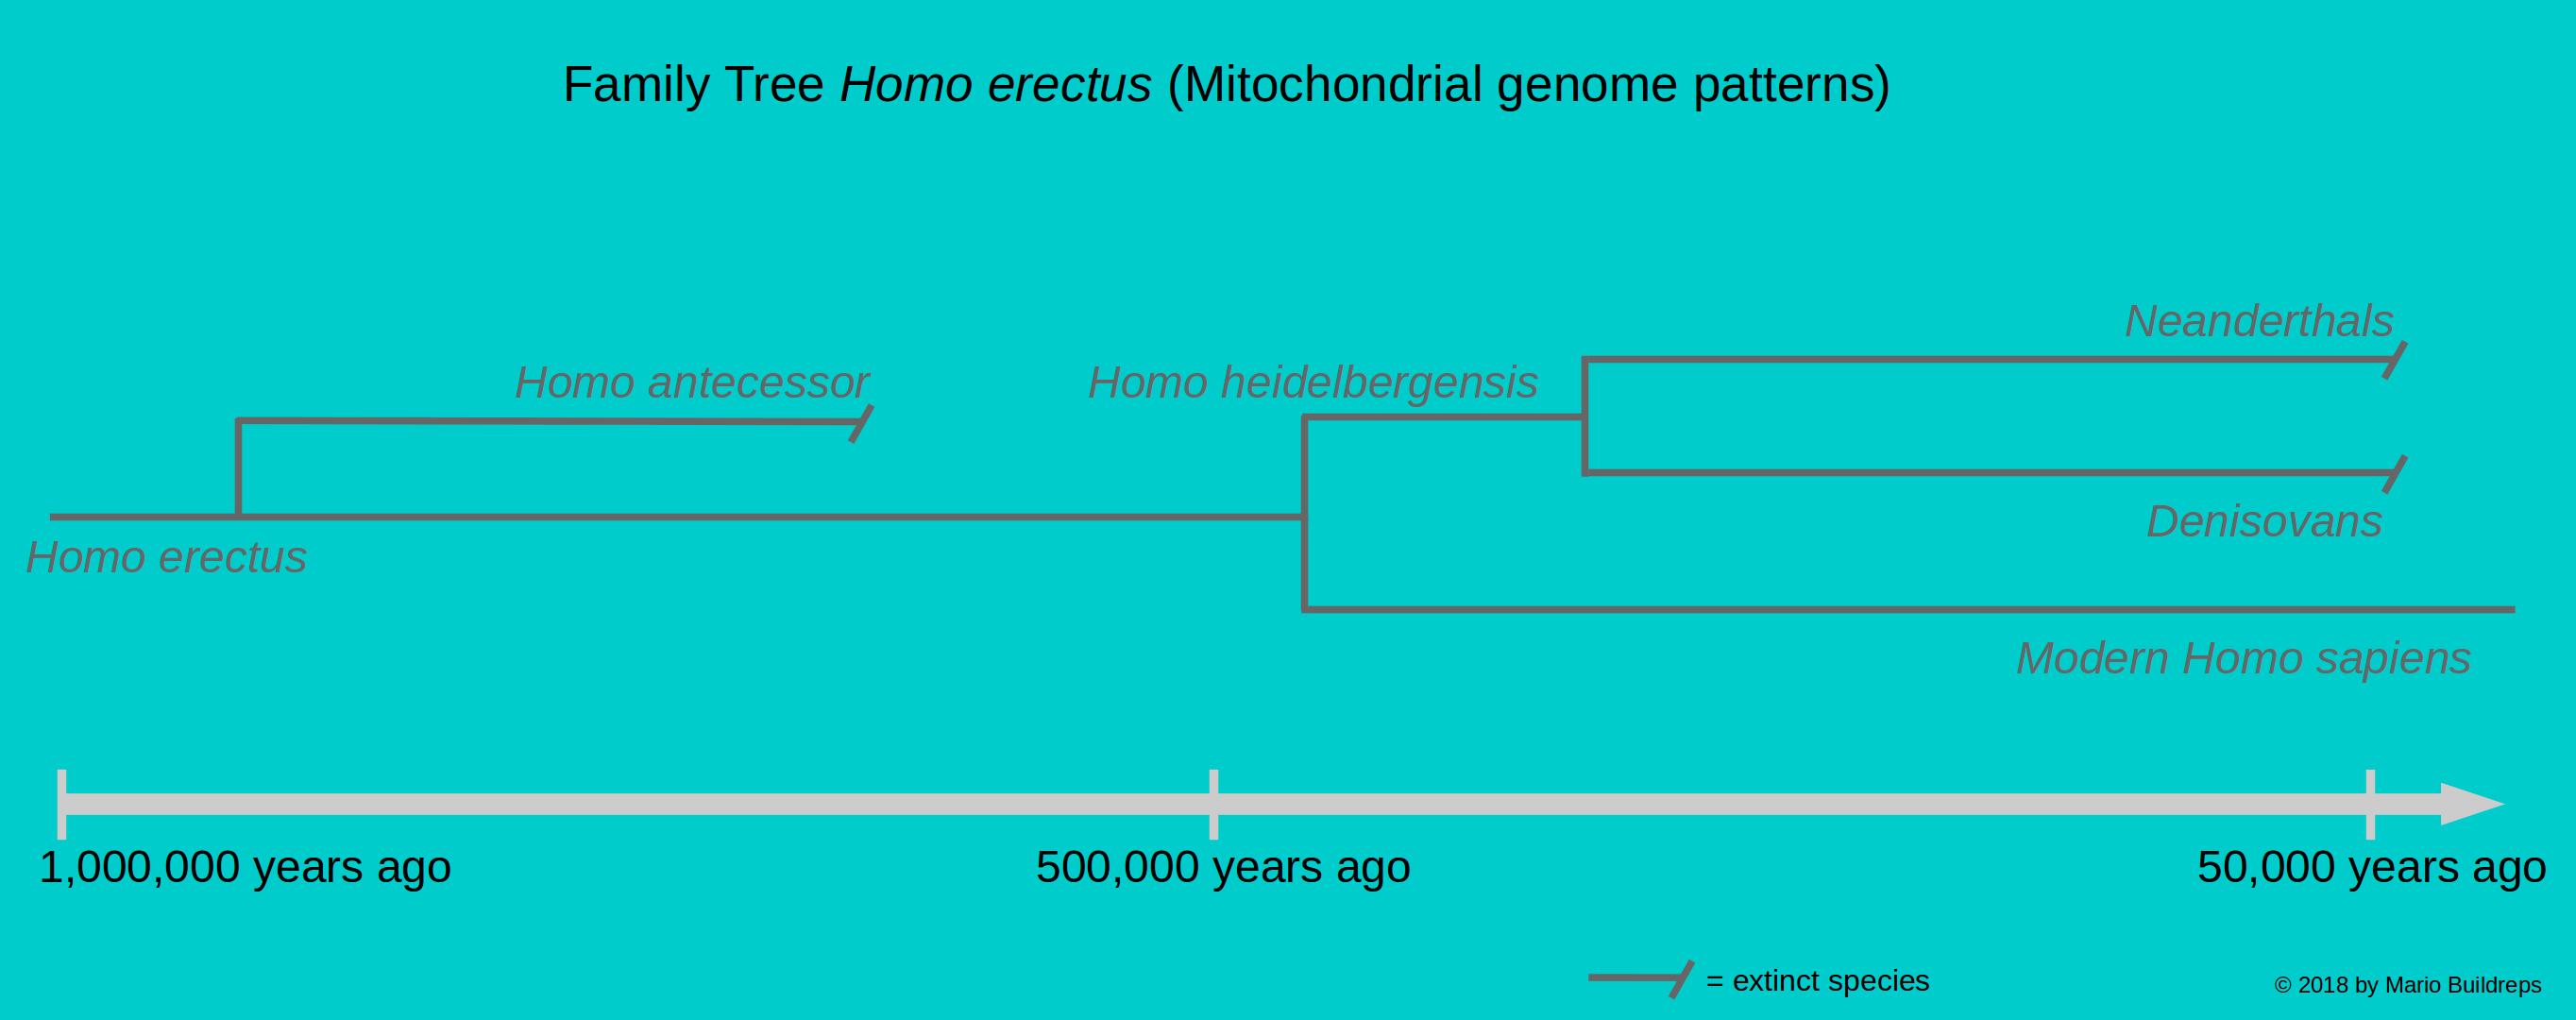 family-tree-homo-erectus-1-2308584-5046282